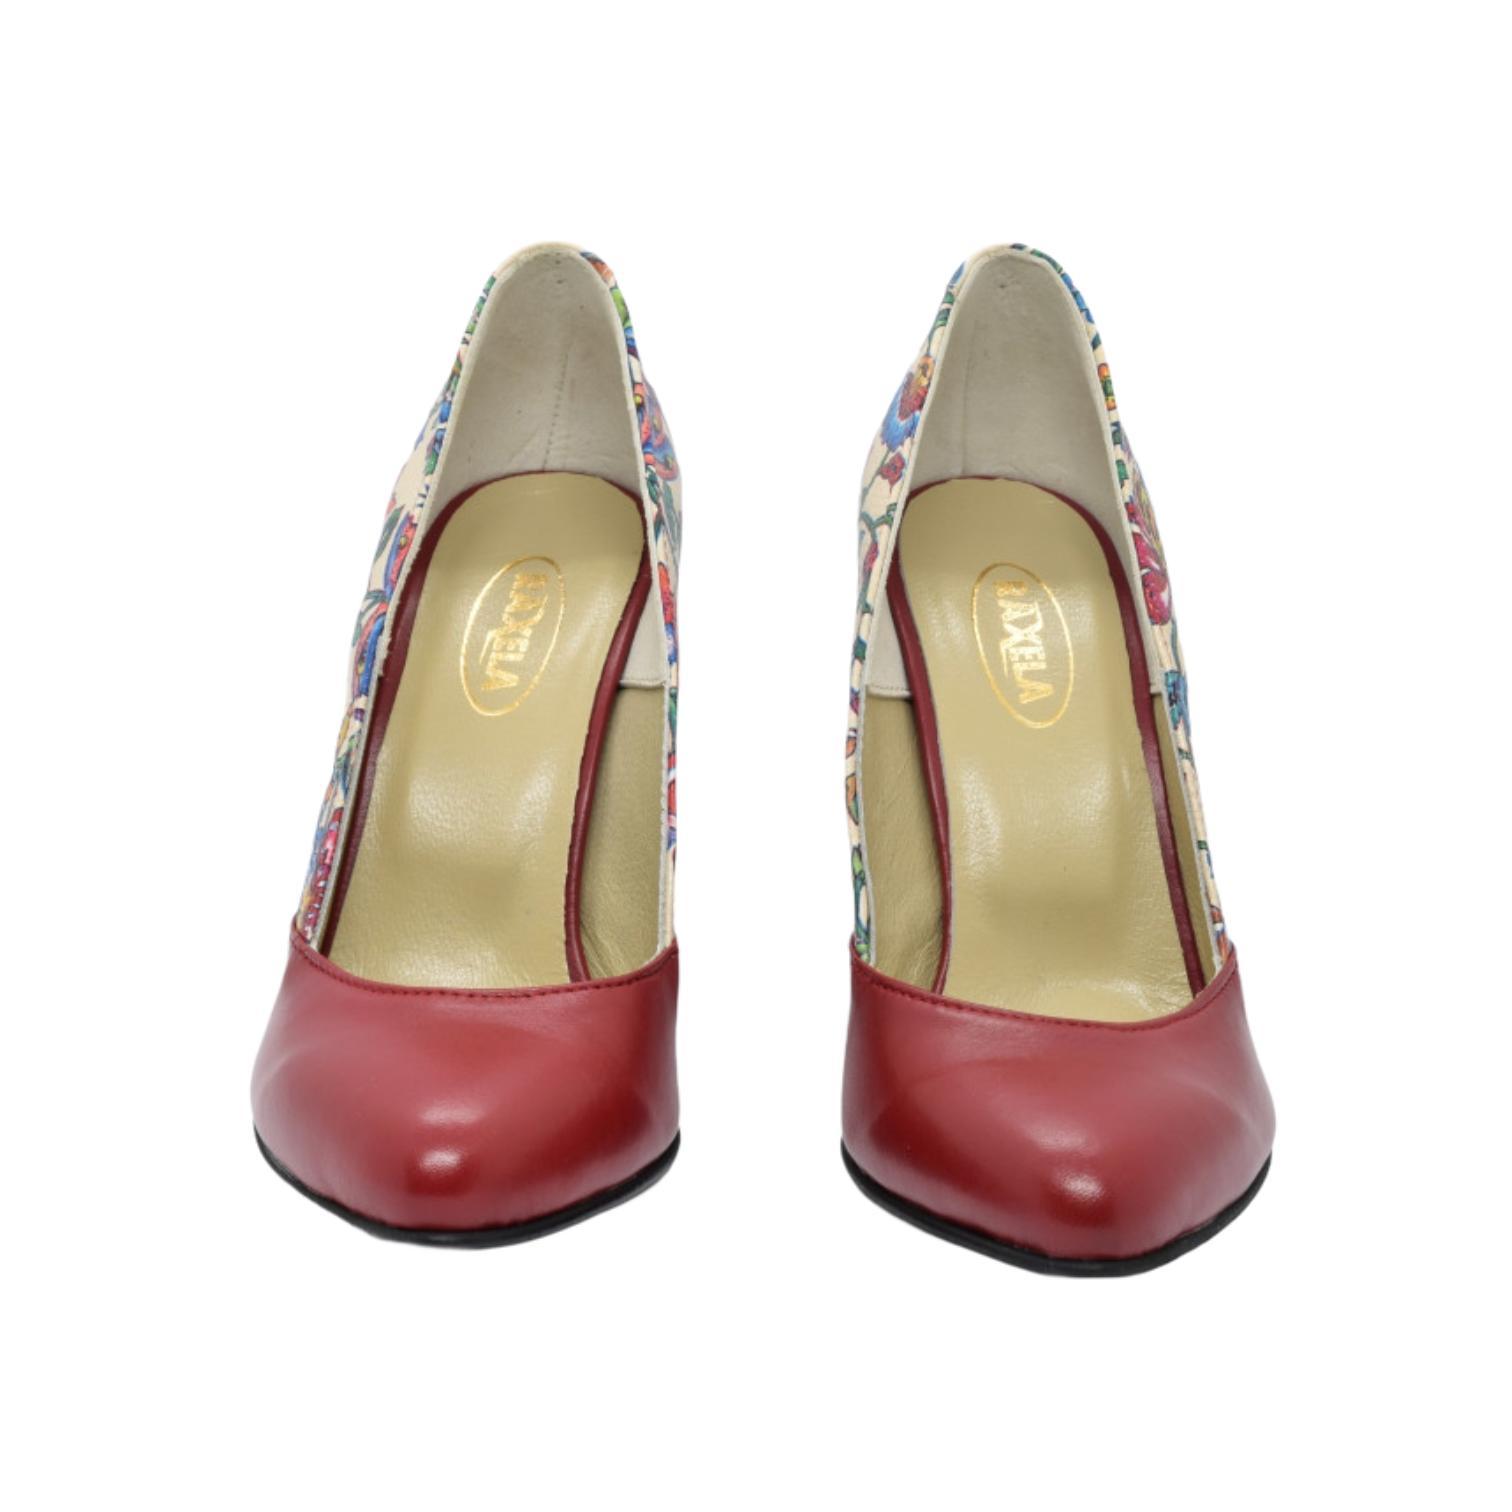 Pantofi rosii cu model floral